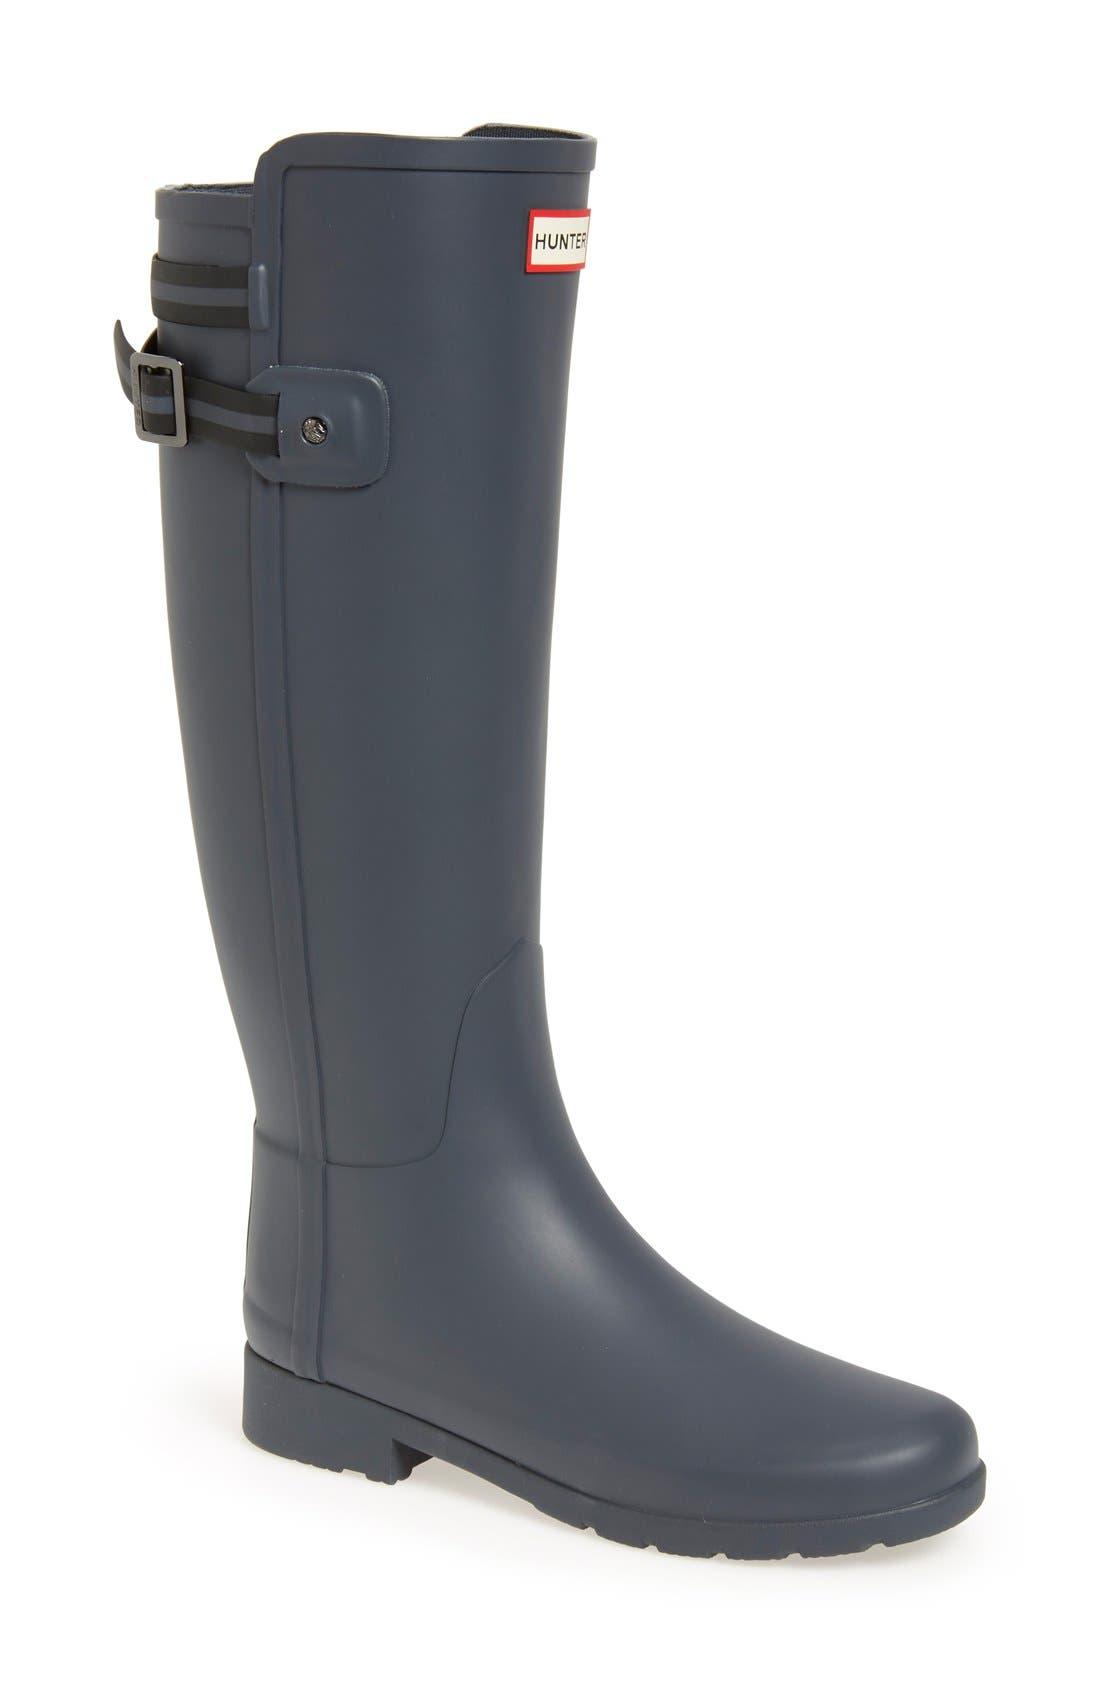 Alternate Image 1 Selected - Hunter 'Original Refined' Rain Boot (Women)